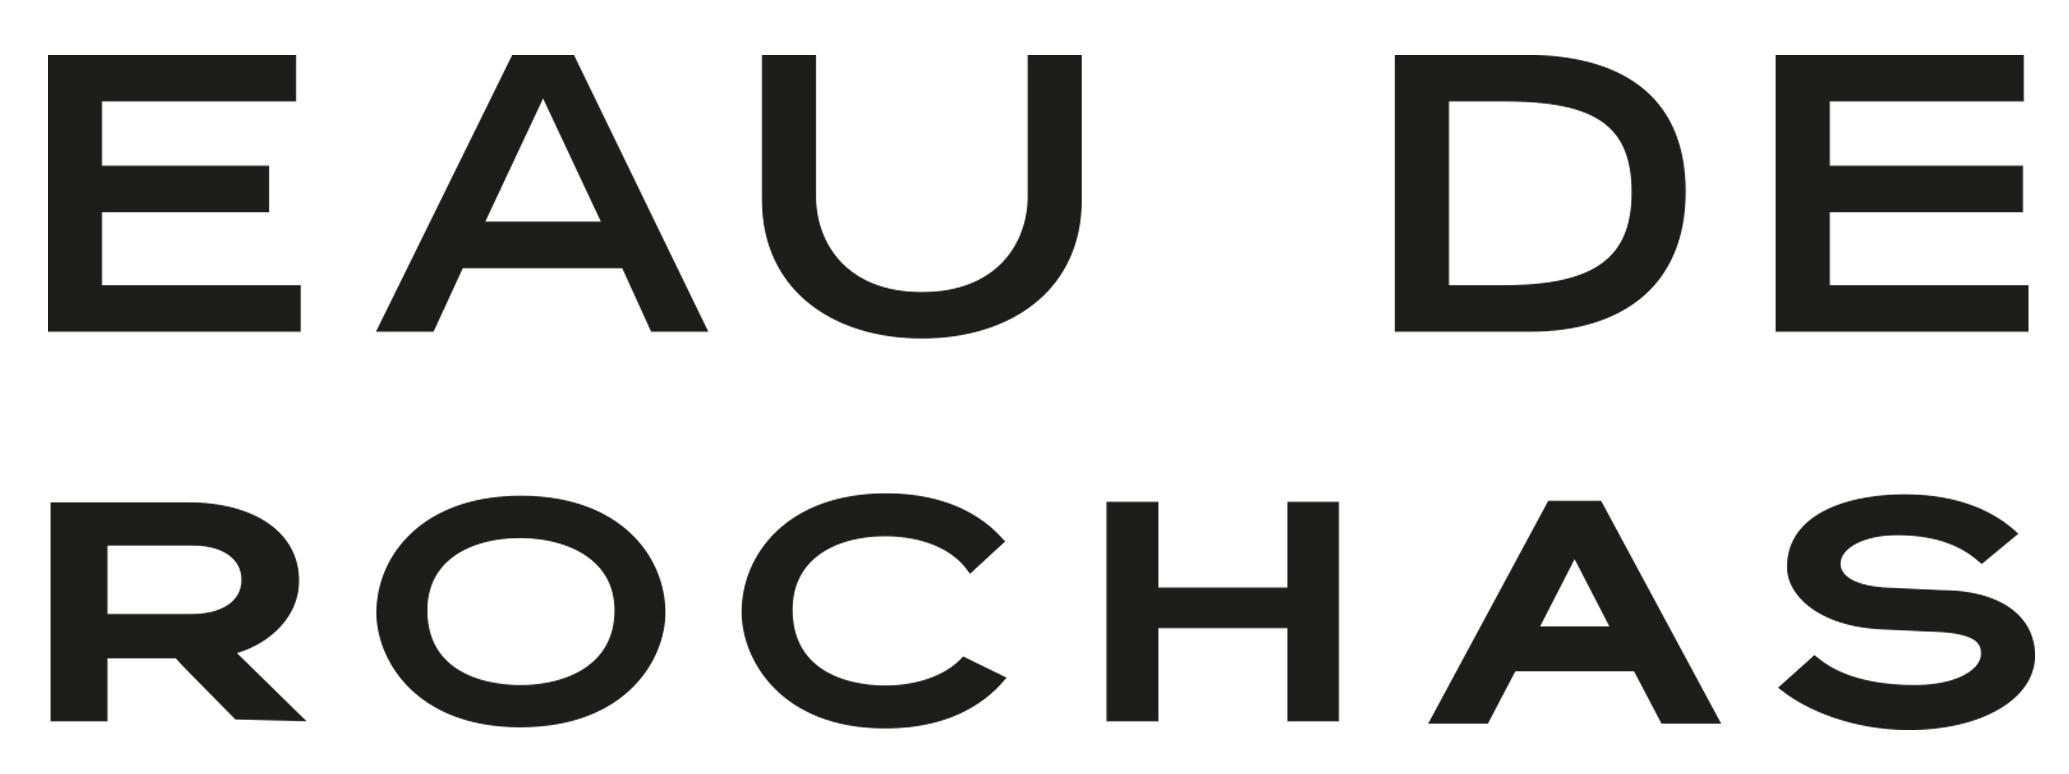 Patricia Bolas – FARLABO logo